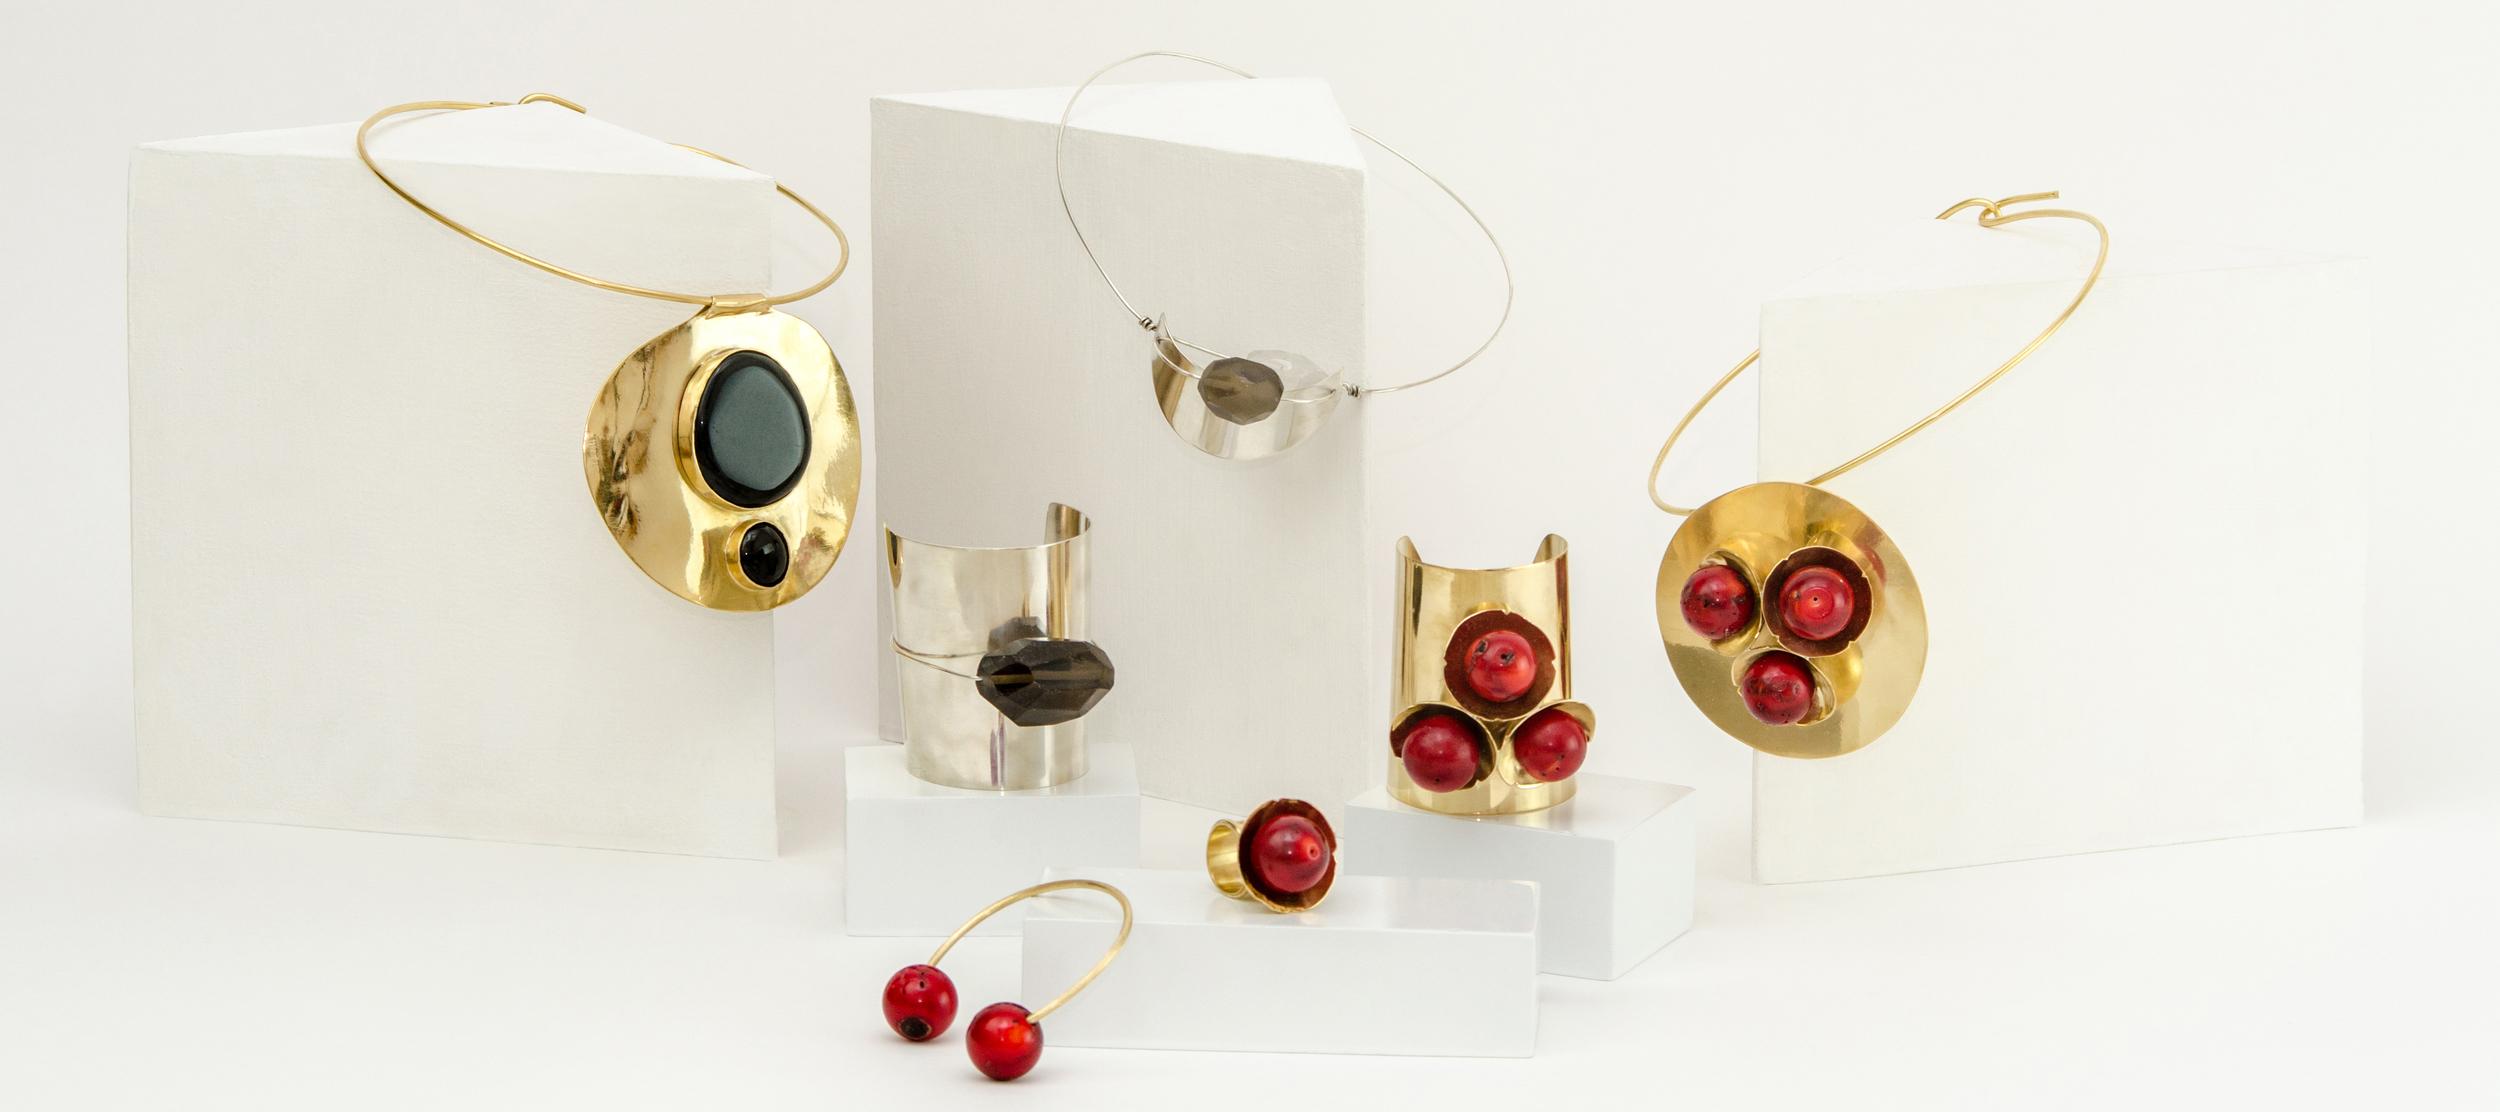 Lucas Mejia, Jewelry Designer